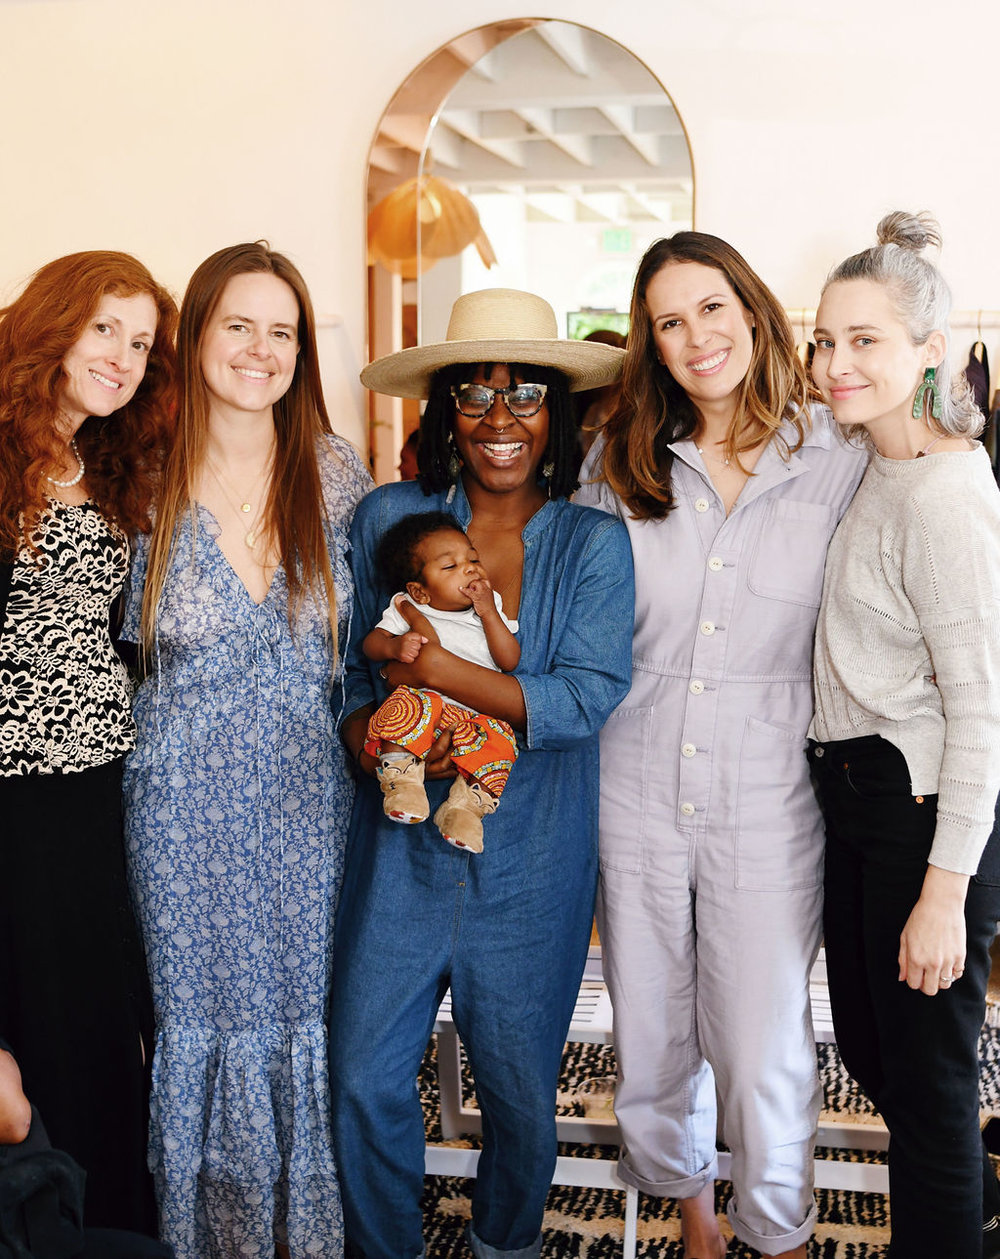 From L to R: Dr. Pamela Abramson-Levine (Lactation Consultant), Stephanie Matthias (Postpartum Doula), Brandi Sellers-Jackson (Birth/Postpartum Doula), Me and Arianna Schioldager (Moderator).